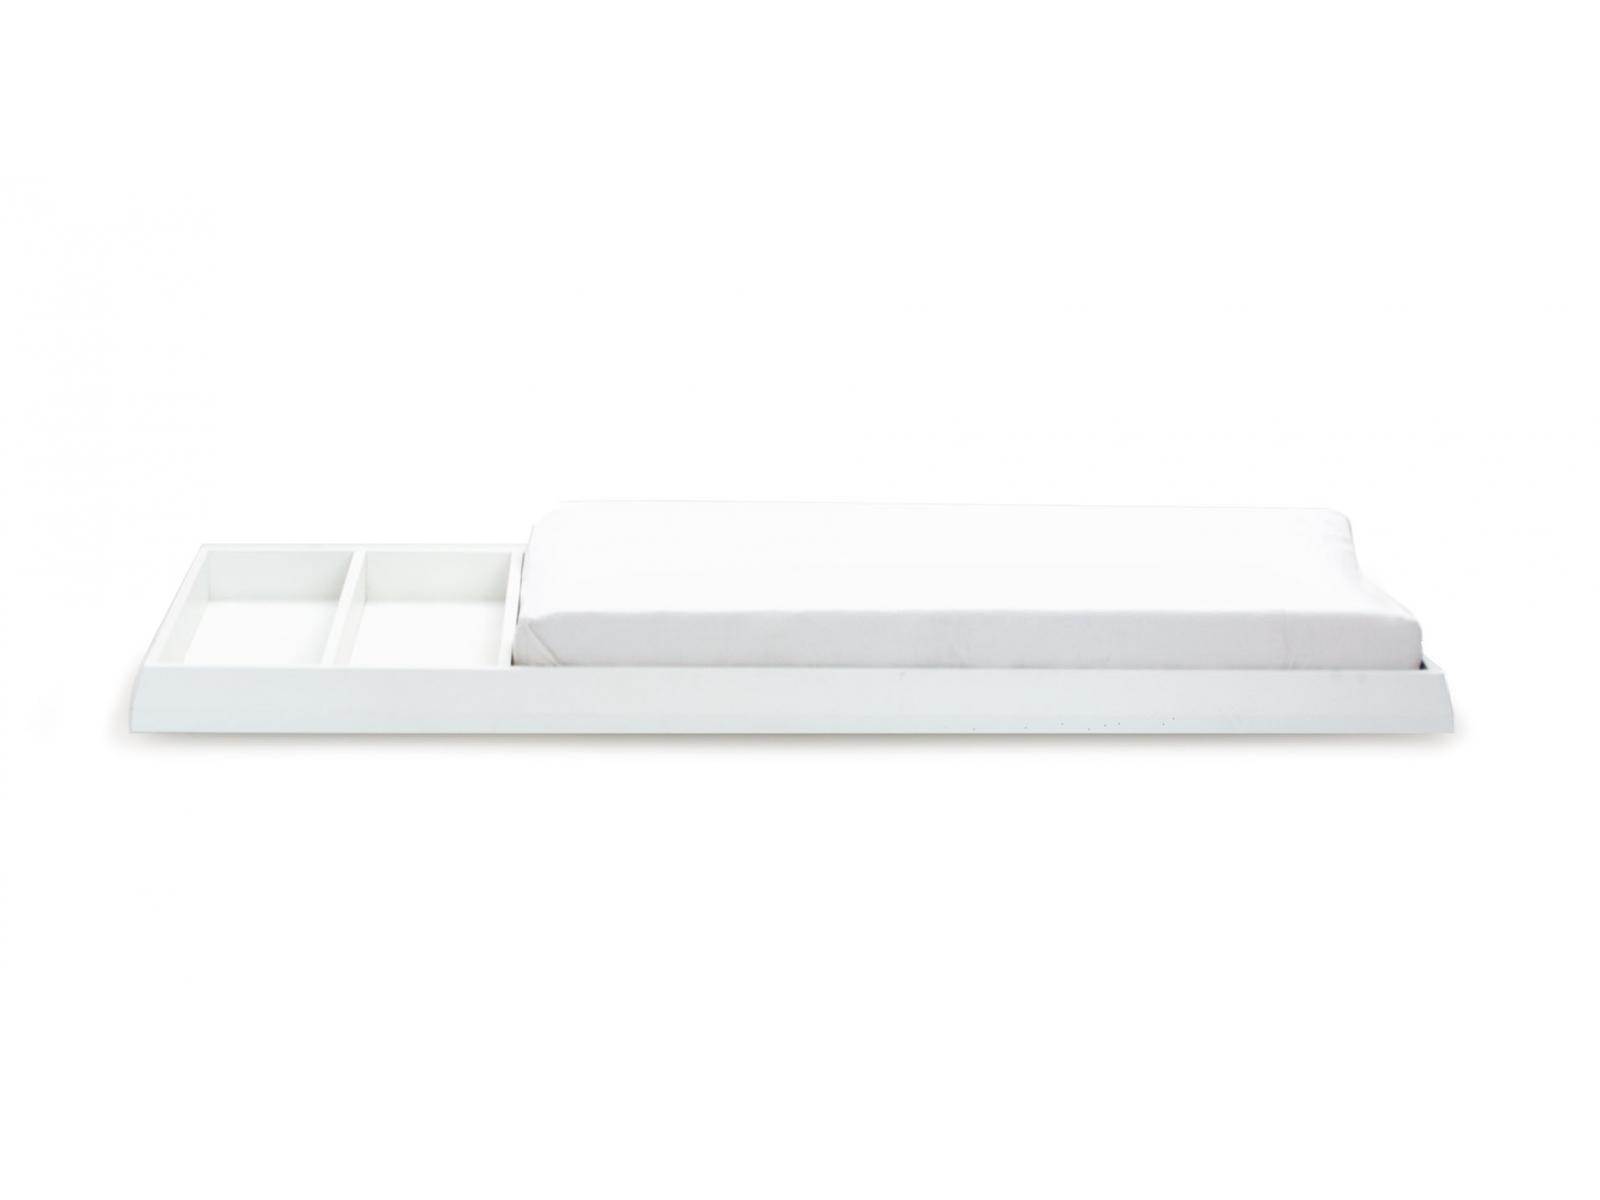 oeuf nyc plan langer xl blanc pour commande merlin 6. Black Bedroom Furniture Sets. Home Design Ideas